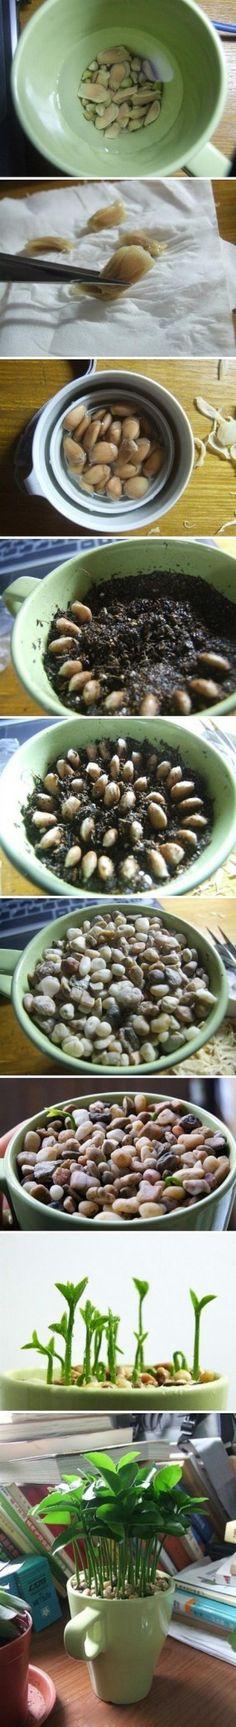 Planta semillas de limón.